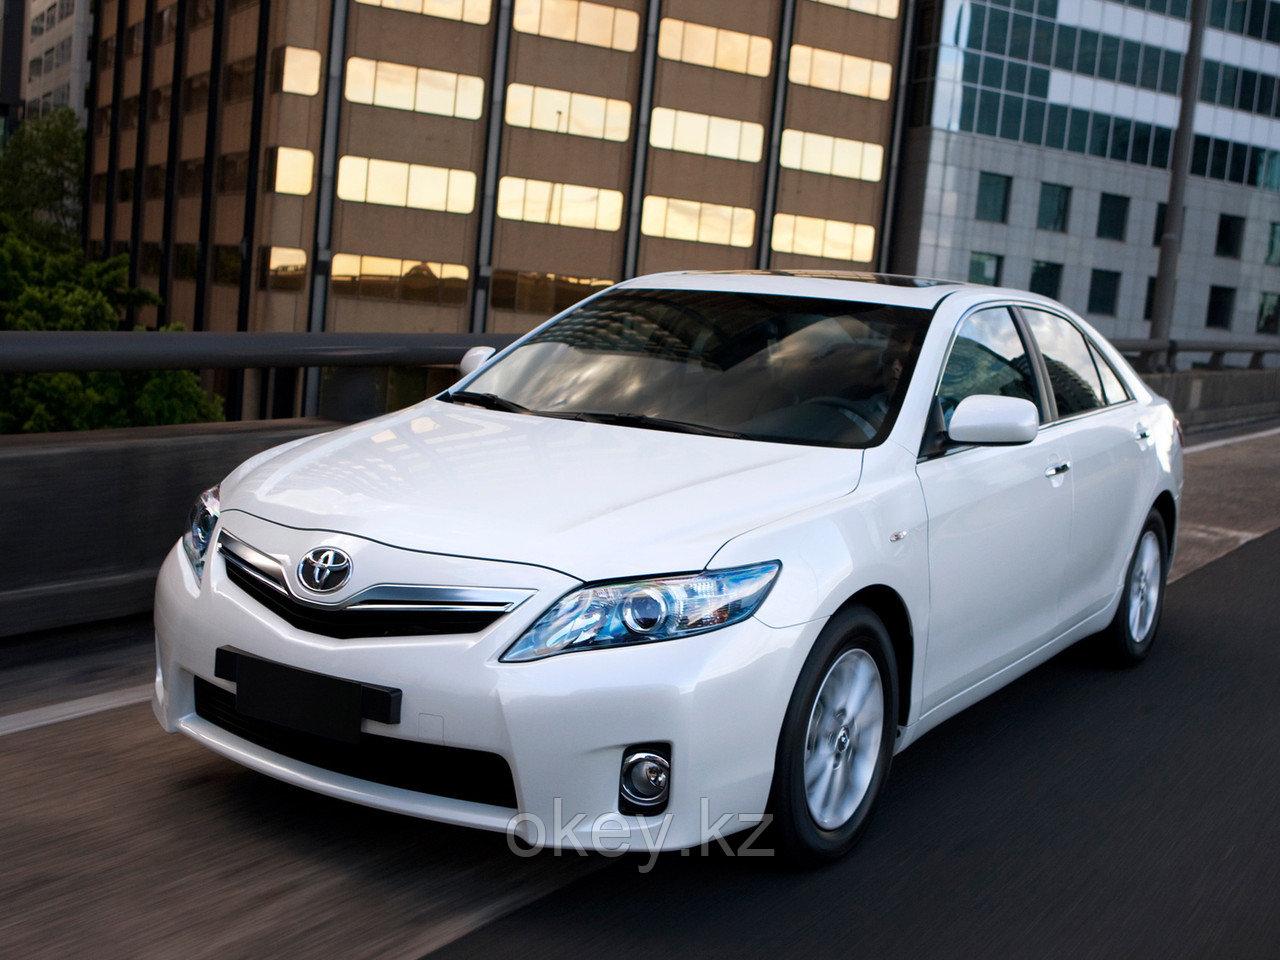 Тормозные колодки Kötl 3429KT для Toyota Camry VI седан (_XV4_) 2.4 VVT-i Hybrid, 2006-2011 года выпуска.